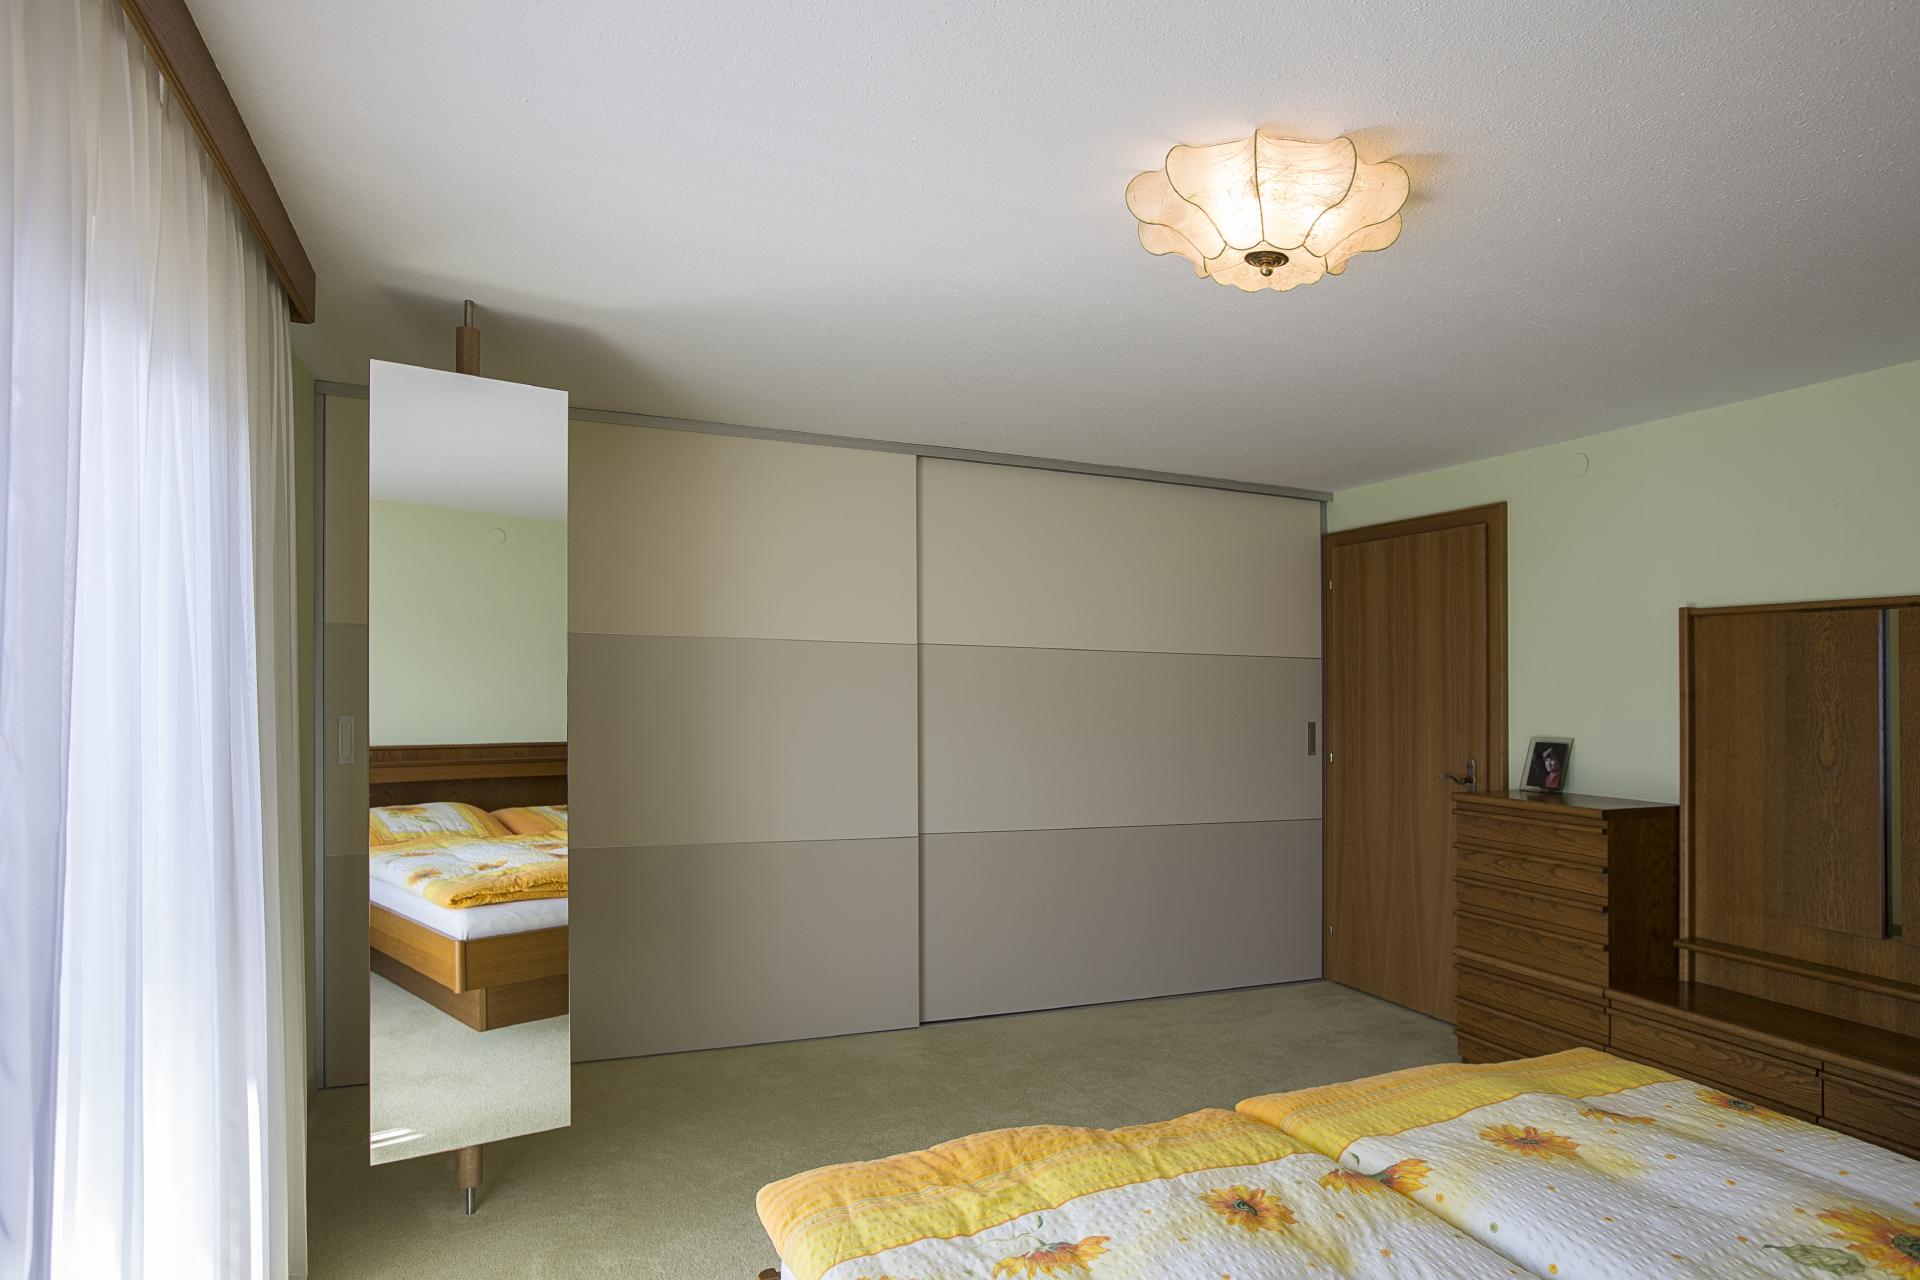 berbreite schiebet ren mit materialwechsel in graut nen. Black Bedroom Furniture Sets. Home Design Ideas